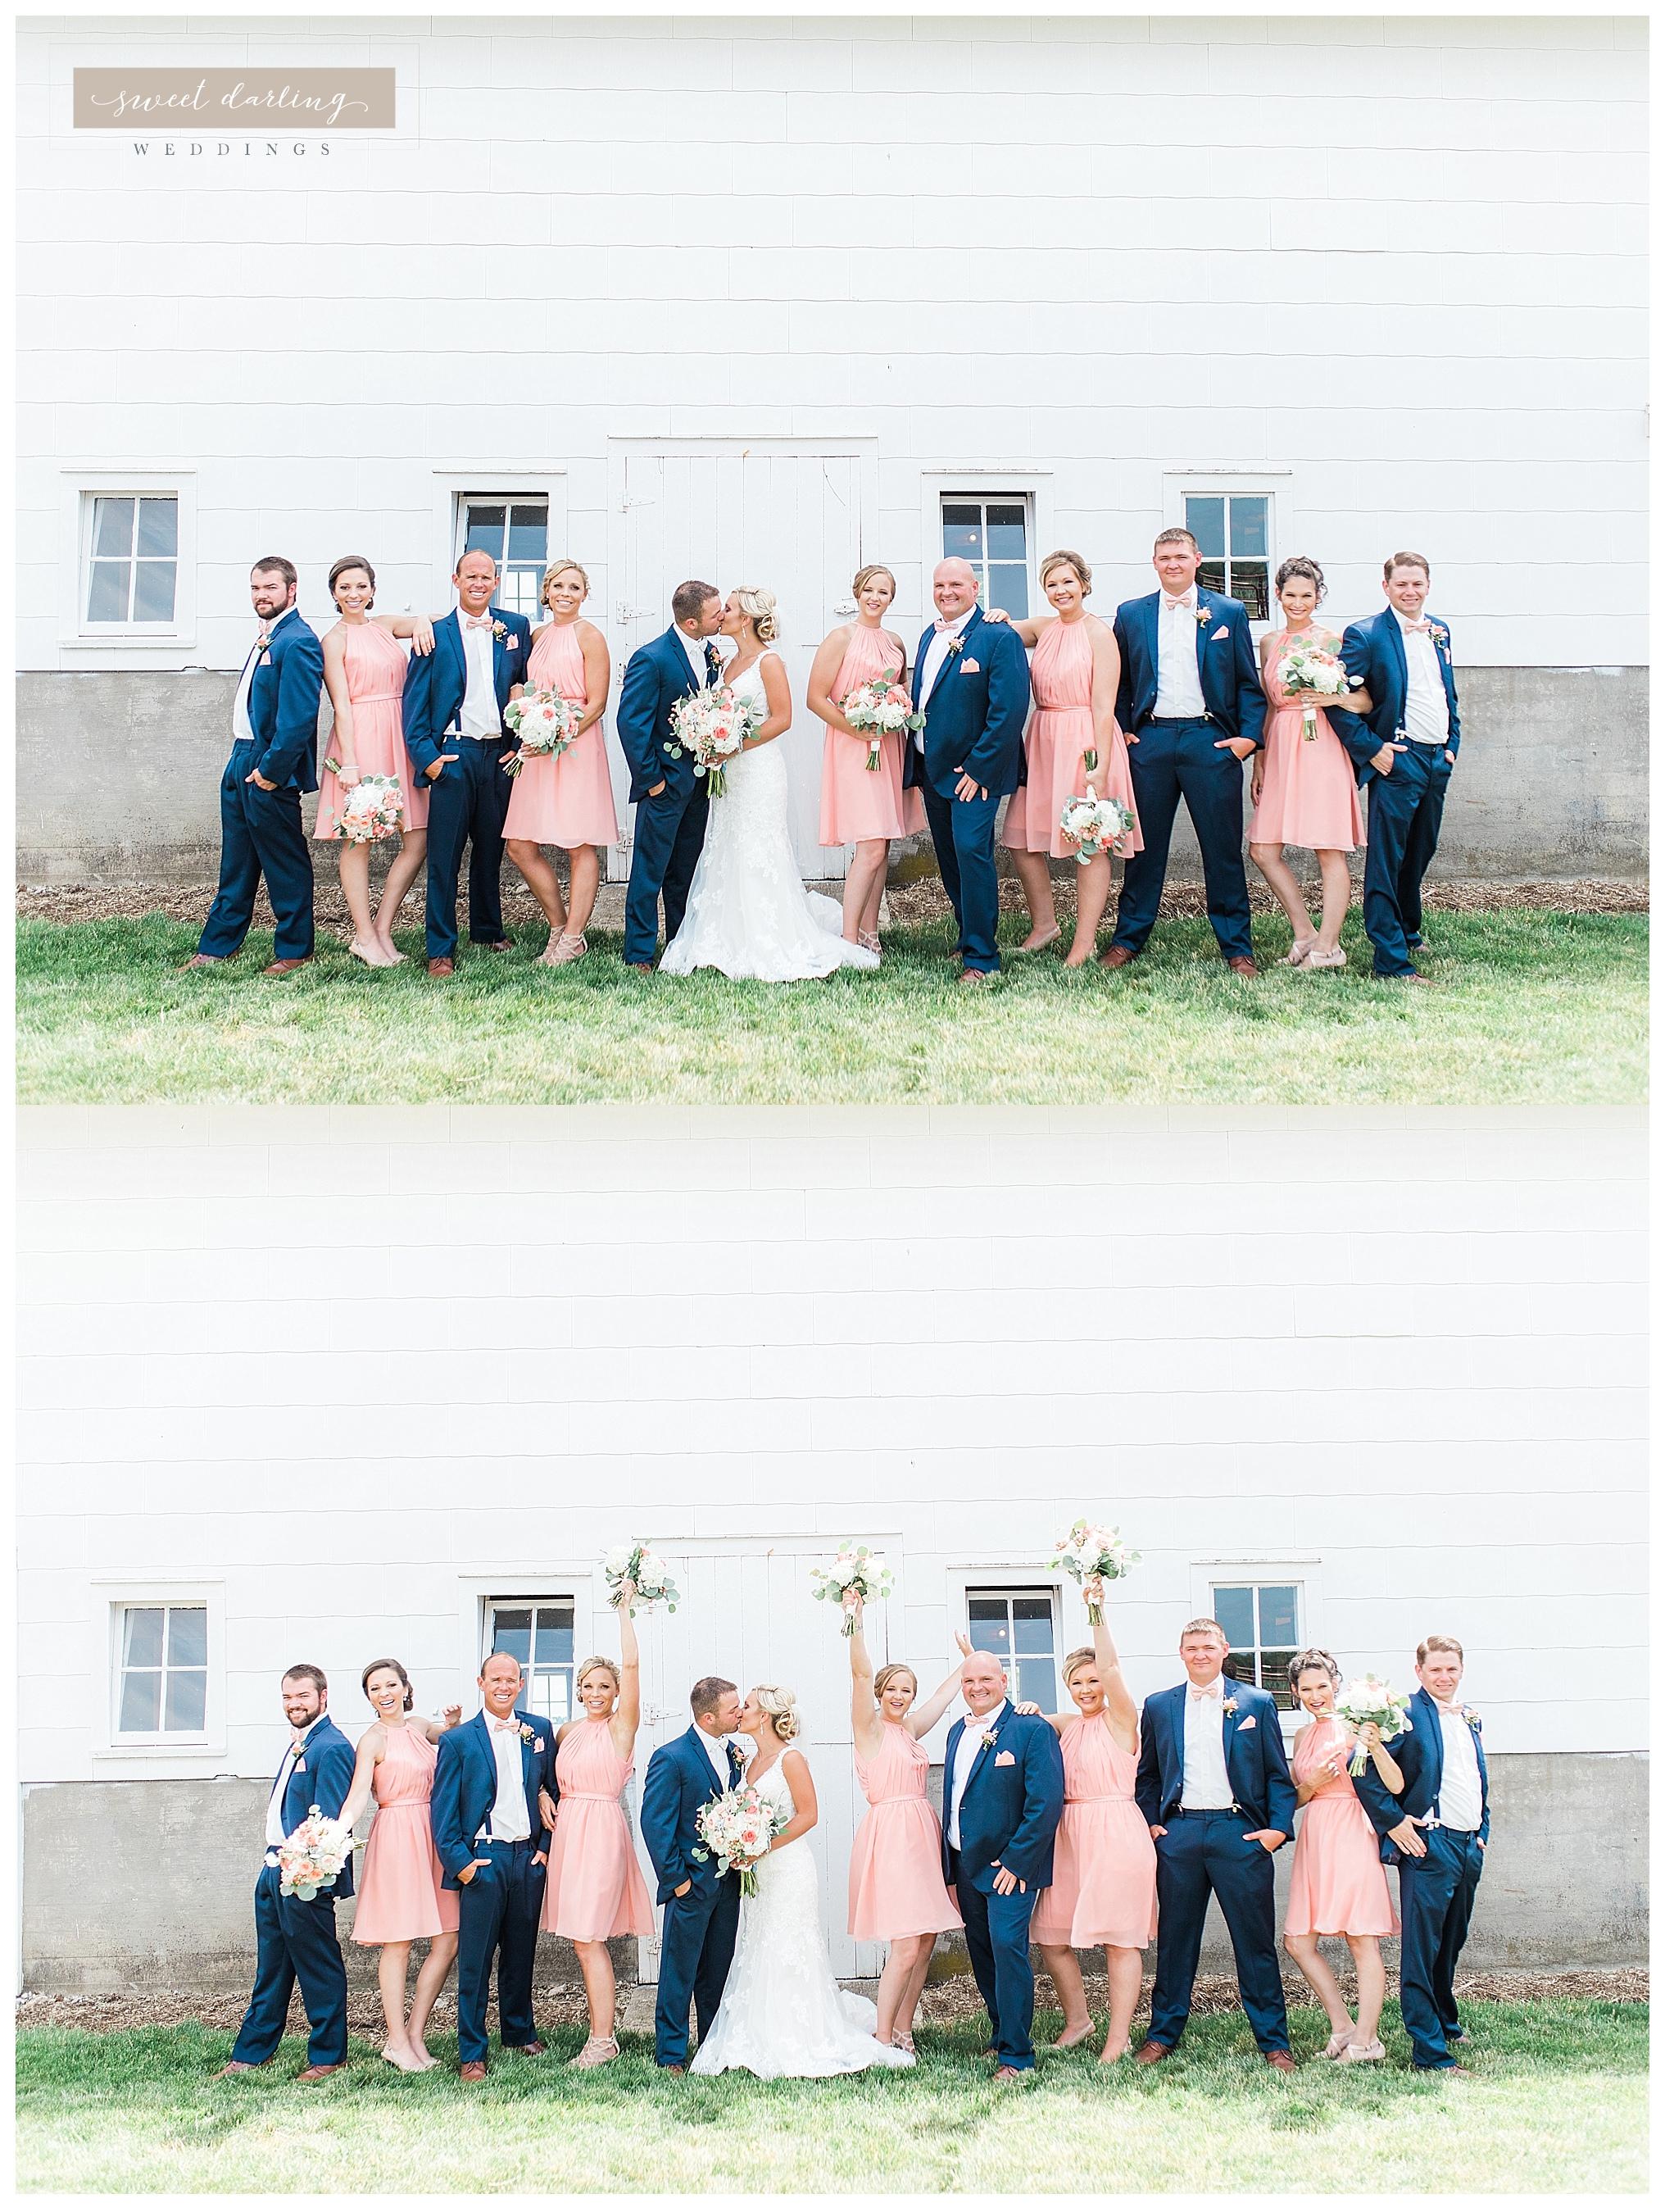 Paxton-illinois-engelbrecht-farmstead-romantic-wedding-photographer-sweet-darling-weddings_1230.jpg